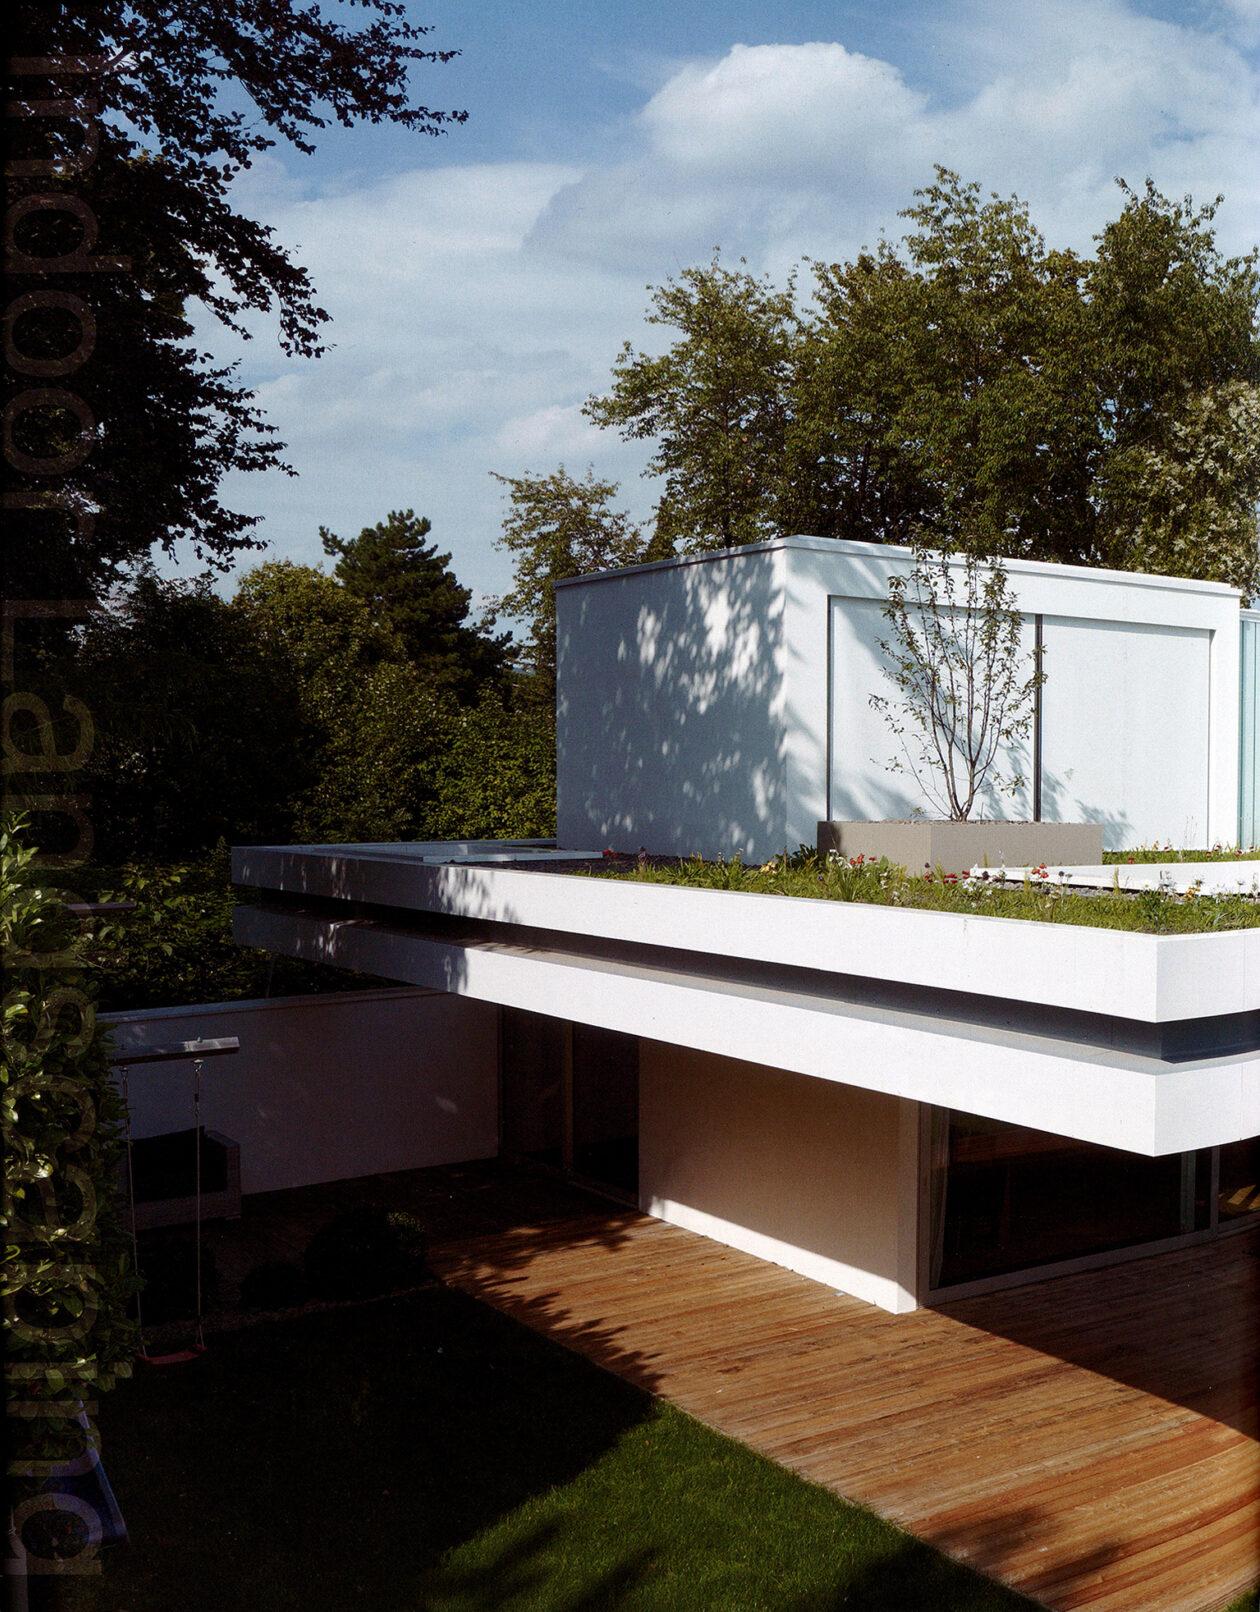 Landscape Architecture 02